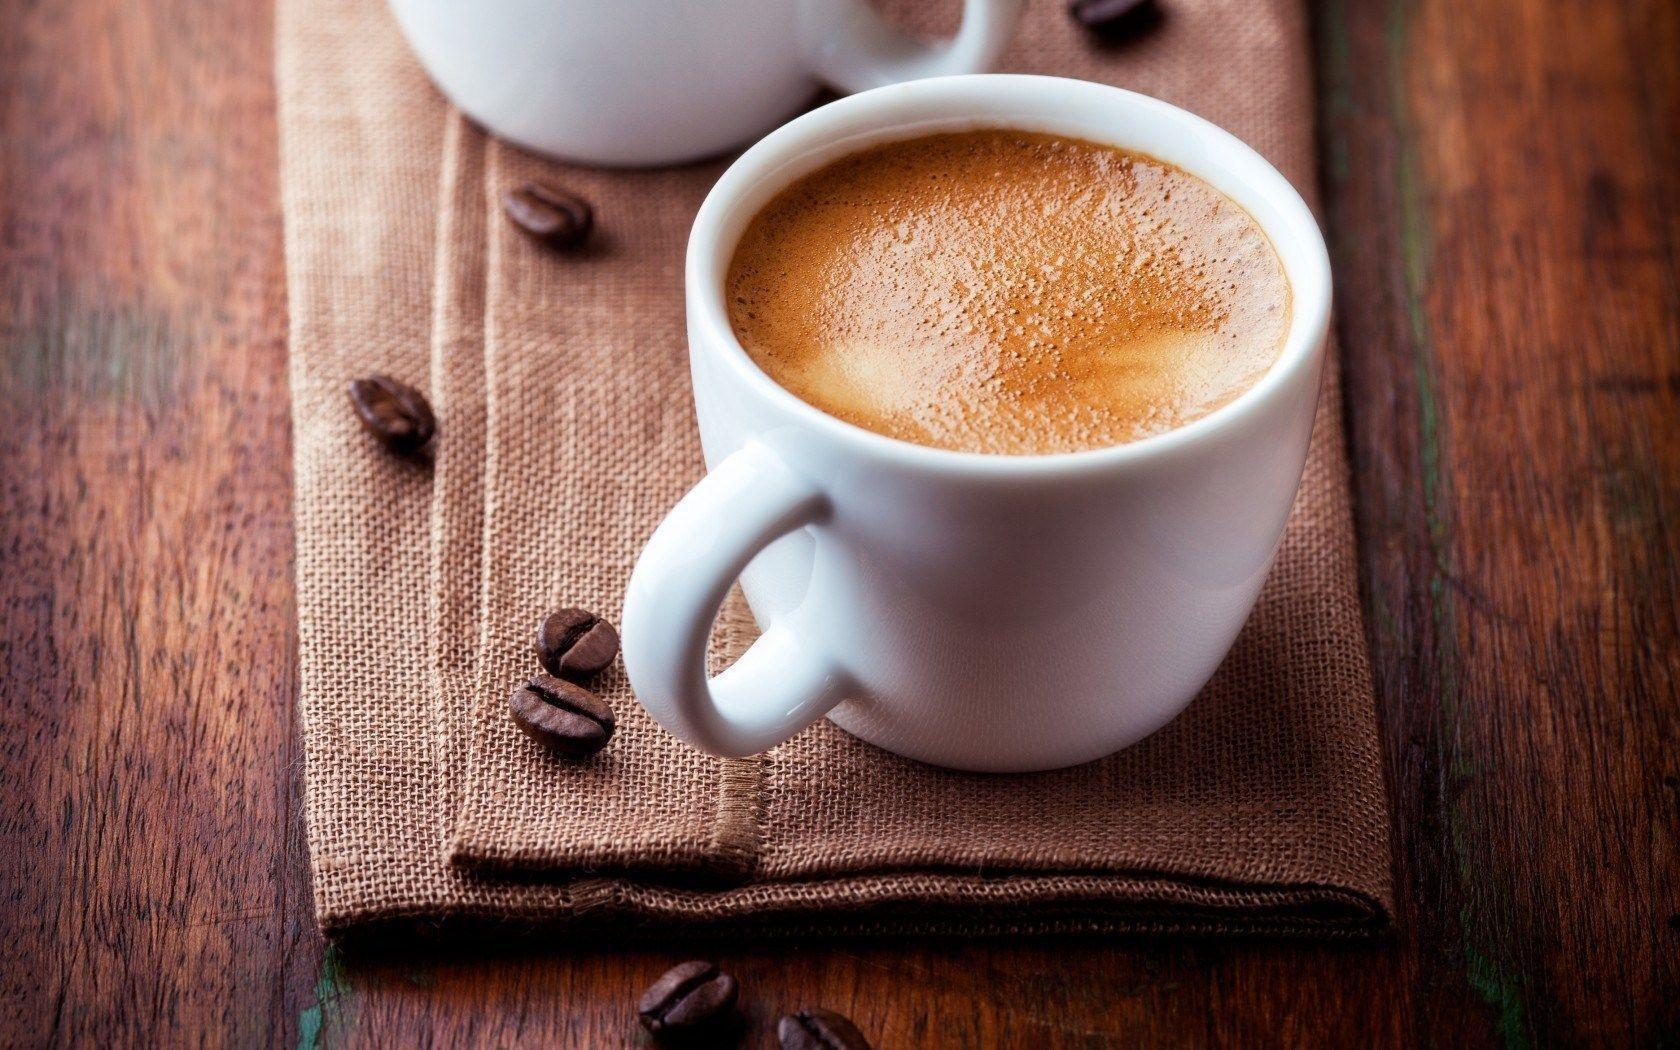 coffee photos hd